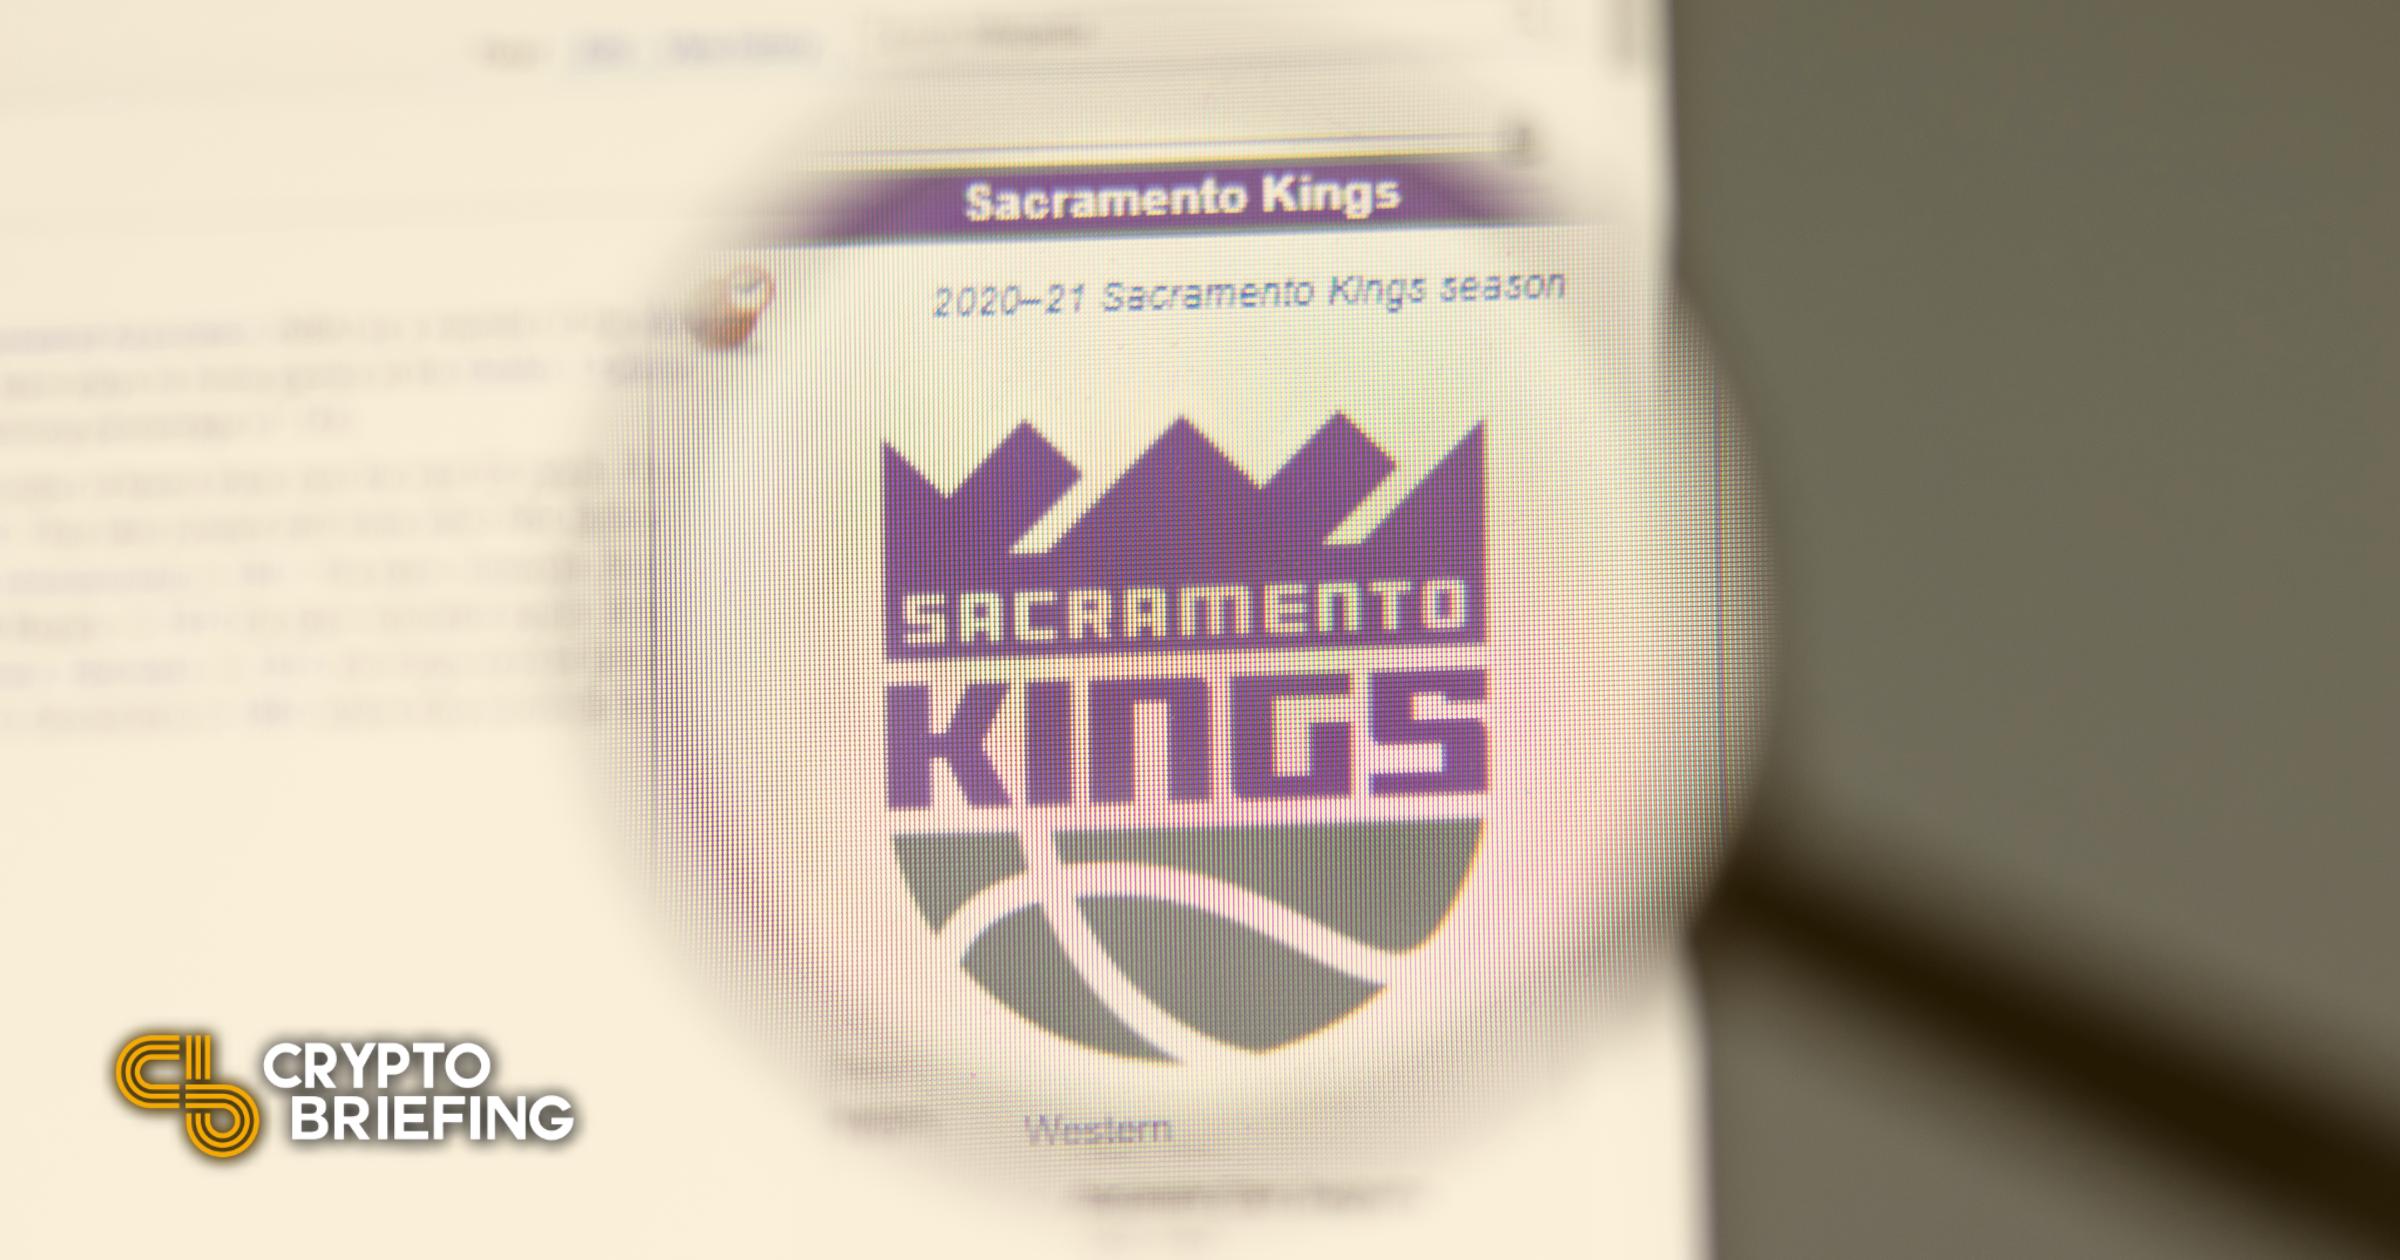 Sacramento Kings ofrecerá salarios de Bitcoin a jugadores y personal